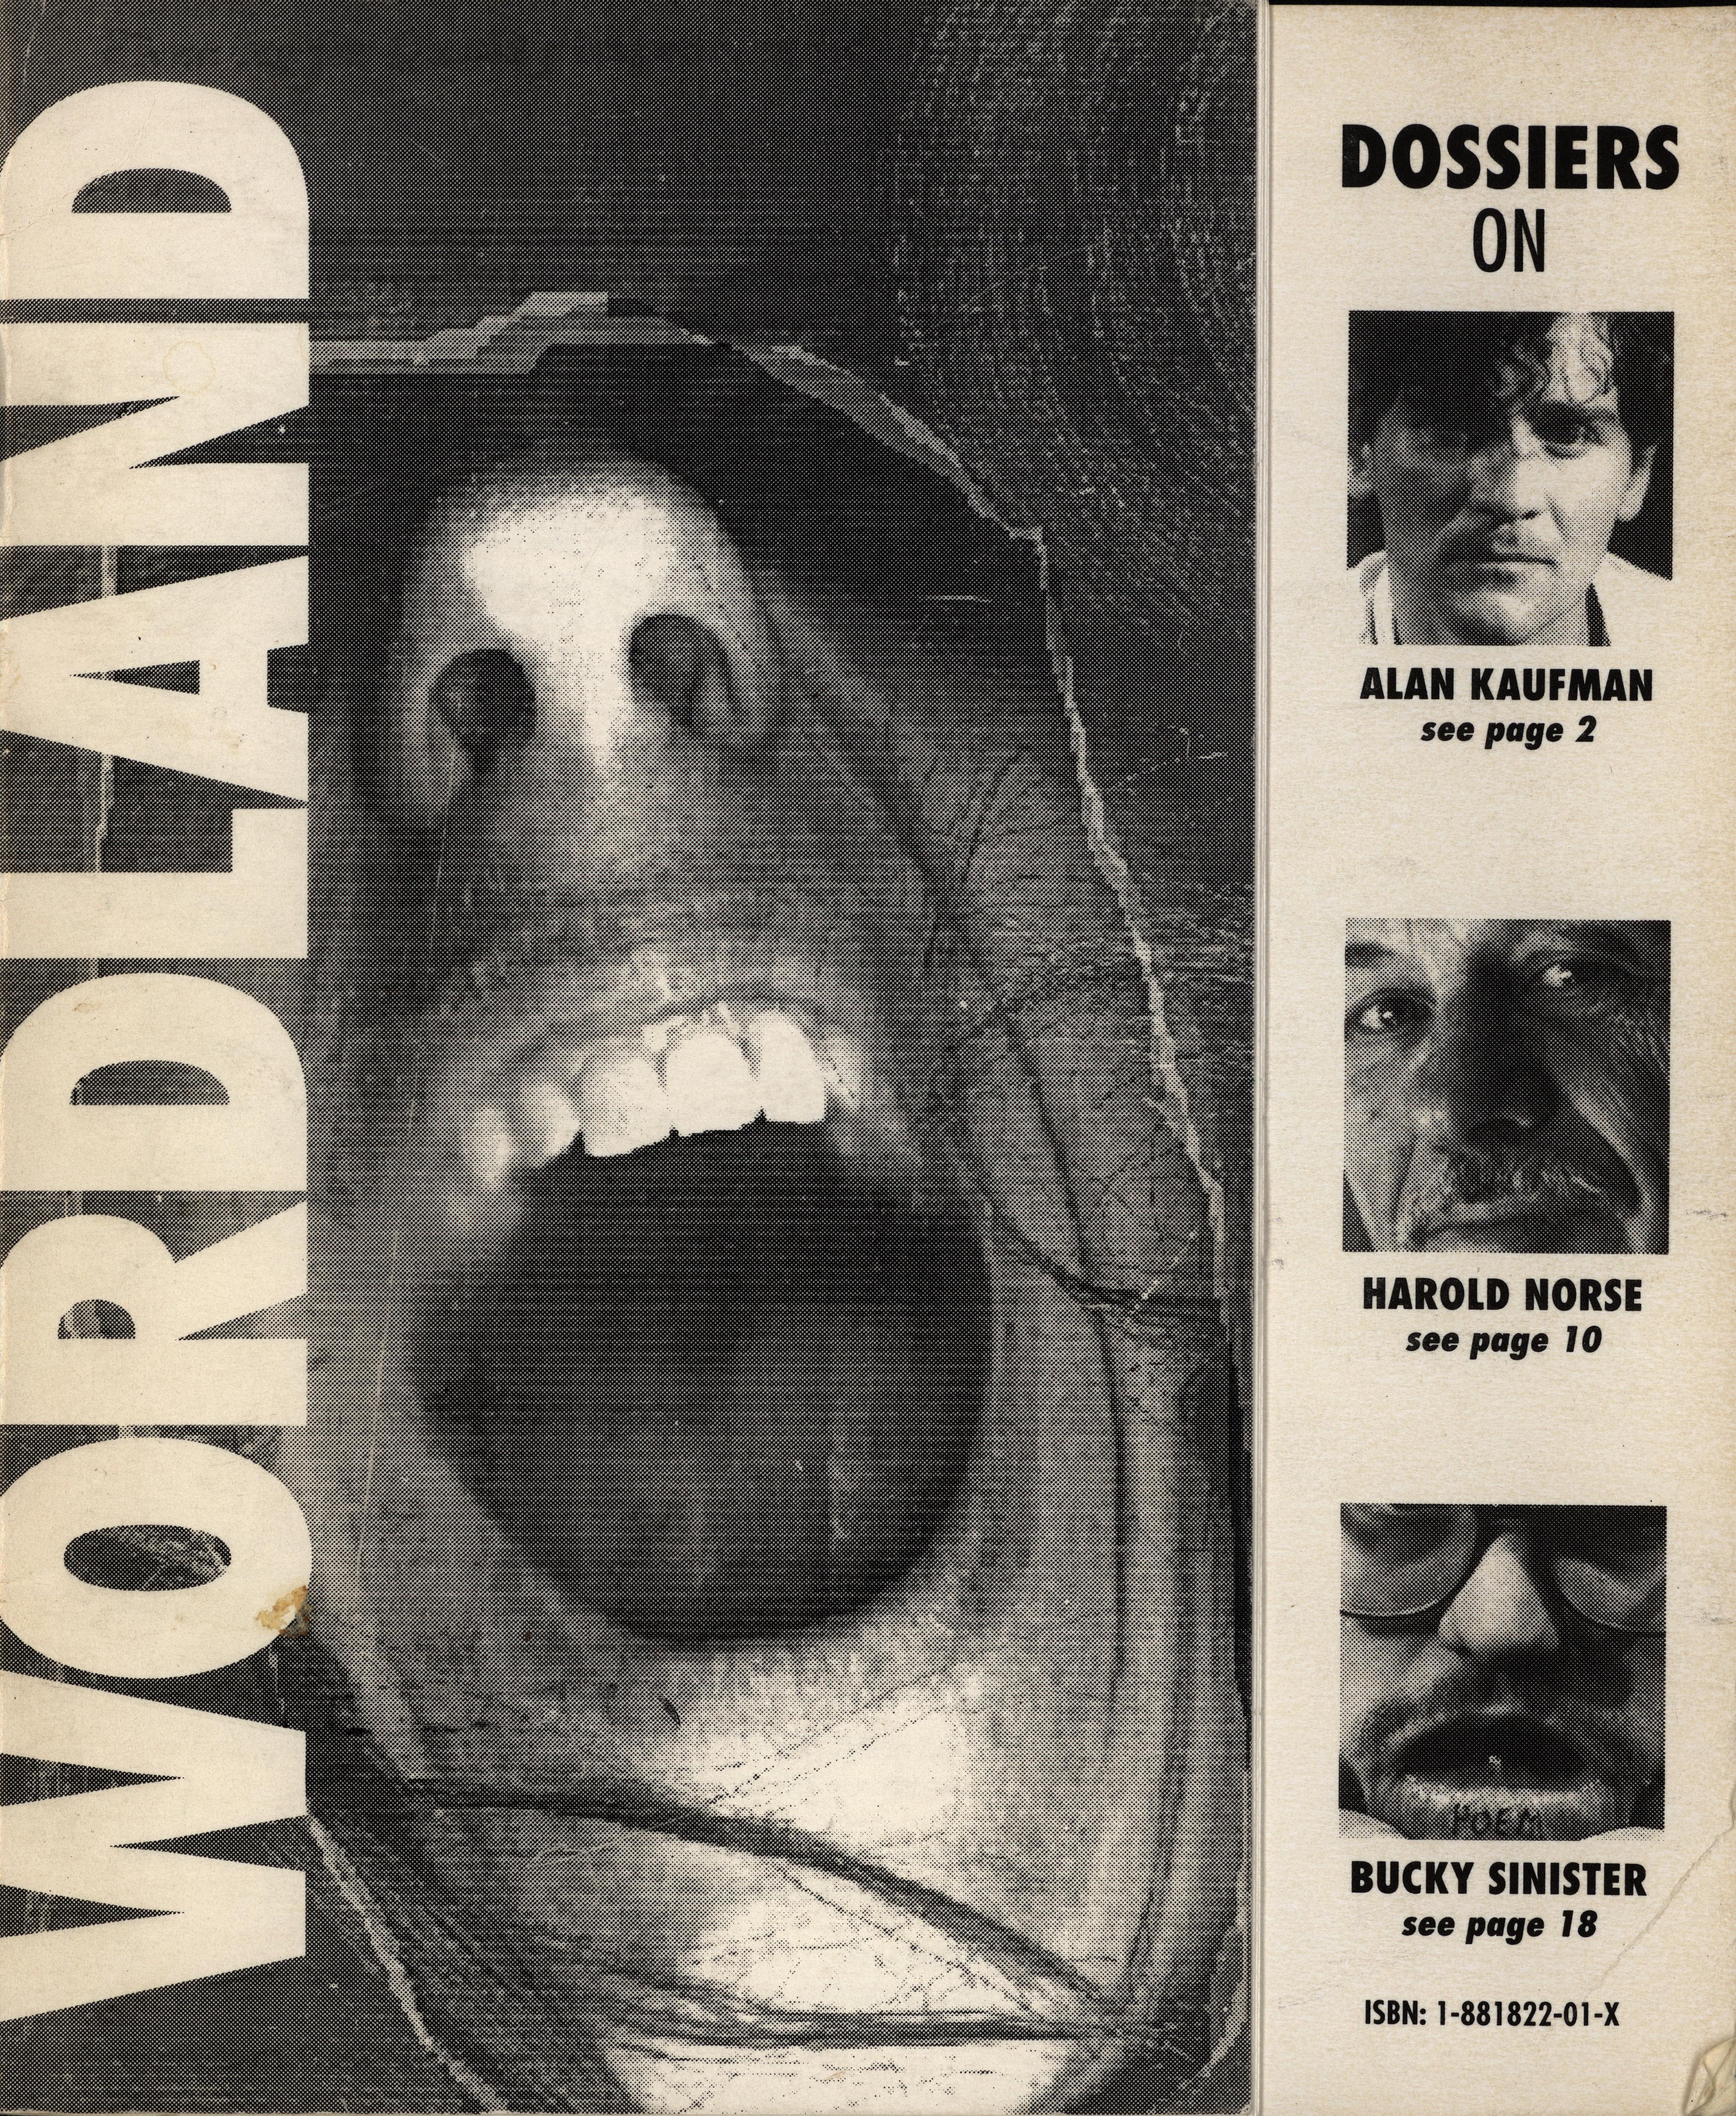 Kaufman, Alan, Harold Norse, and Bucky Sinister. Wordland. San Francisco: Wordland Books, 1992